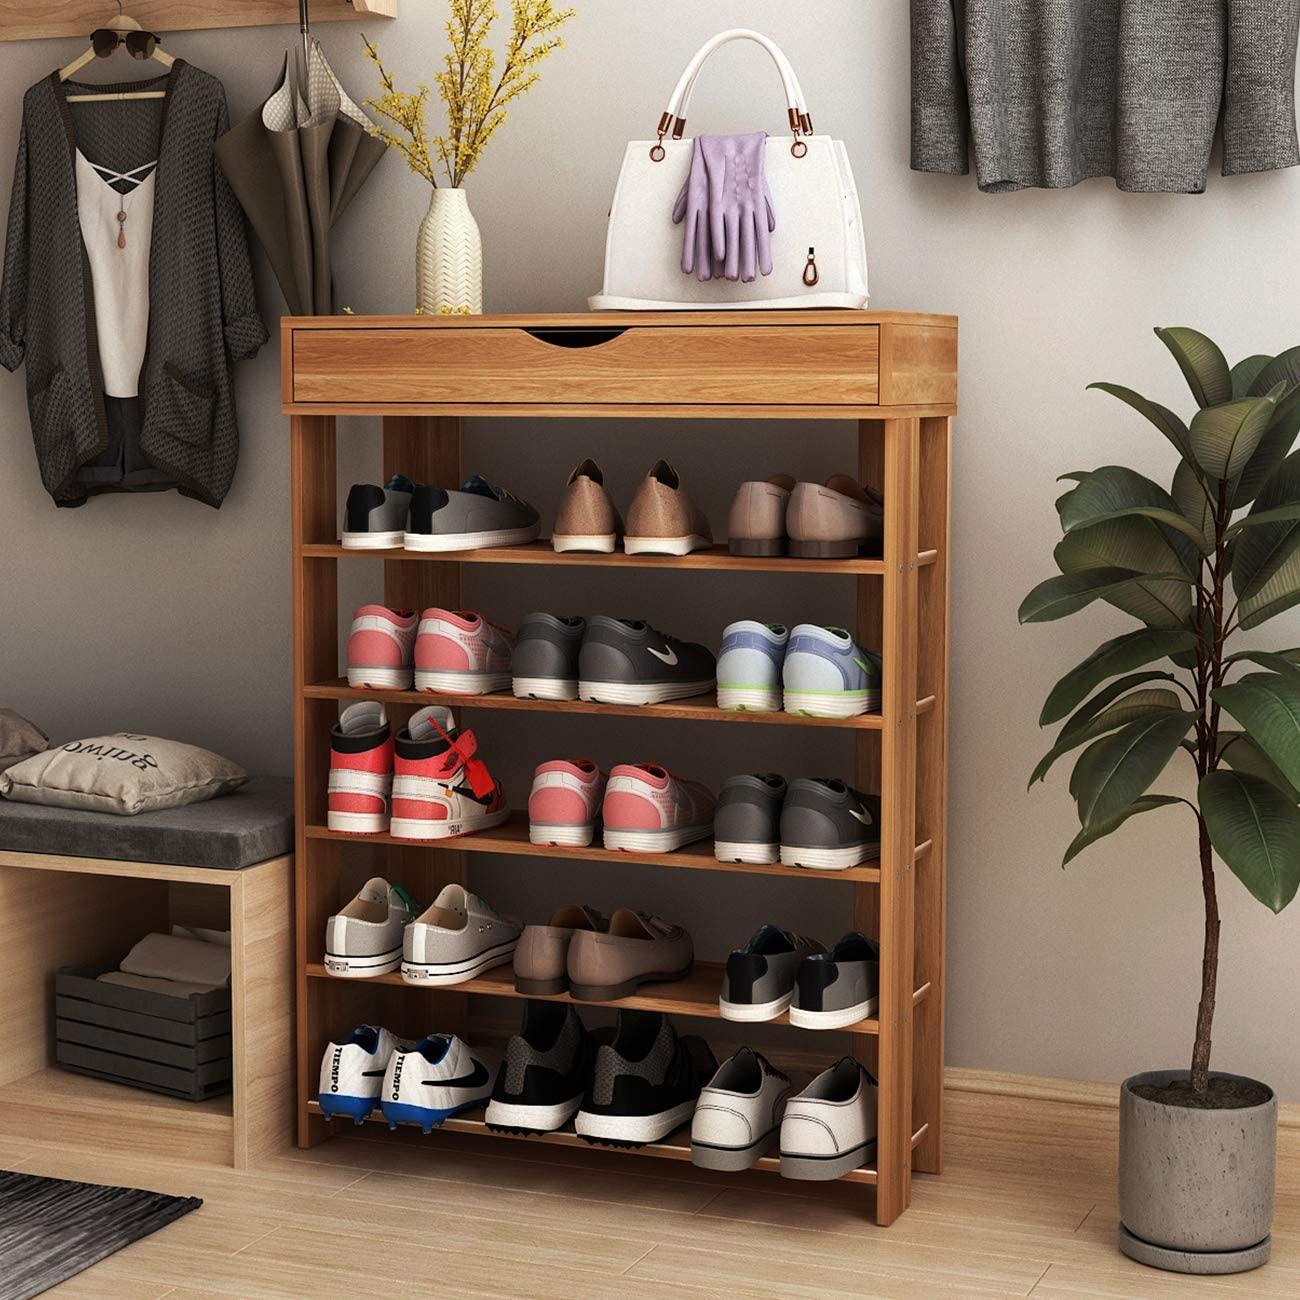 SogesGame 5-Tier Shoe Rack 29.5inch Wooden Shoe Storage Shelf Shoe Organizer for Entryway,Teak,L24-TK-S8-US